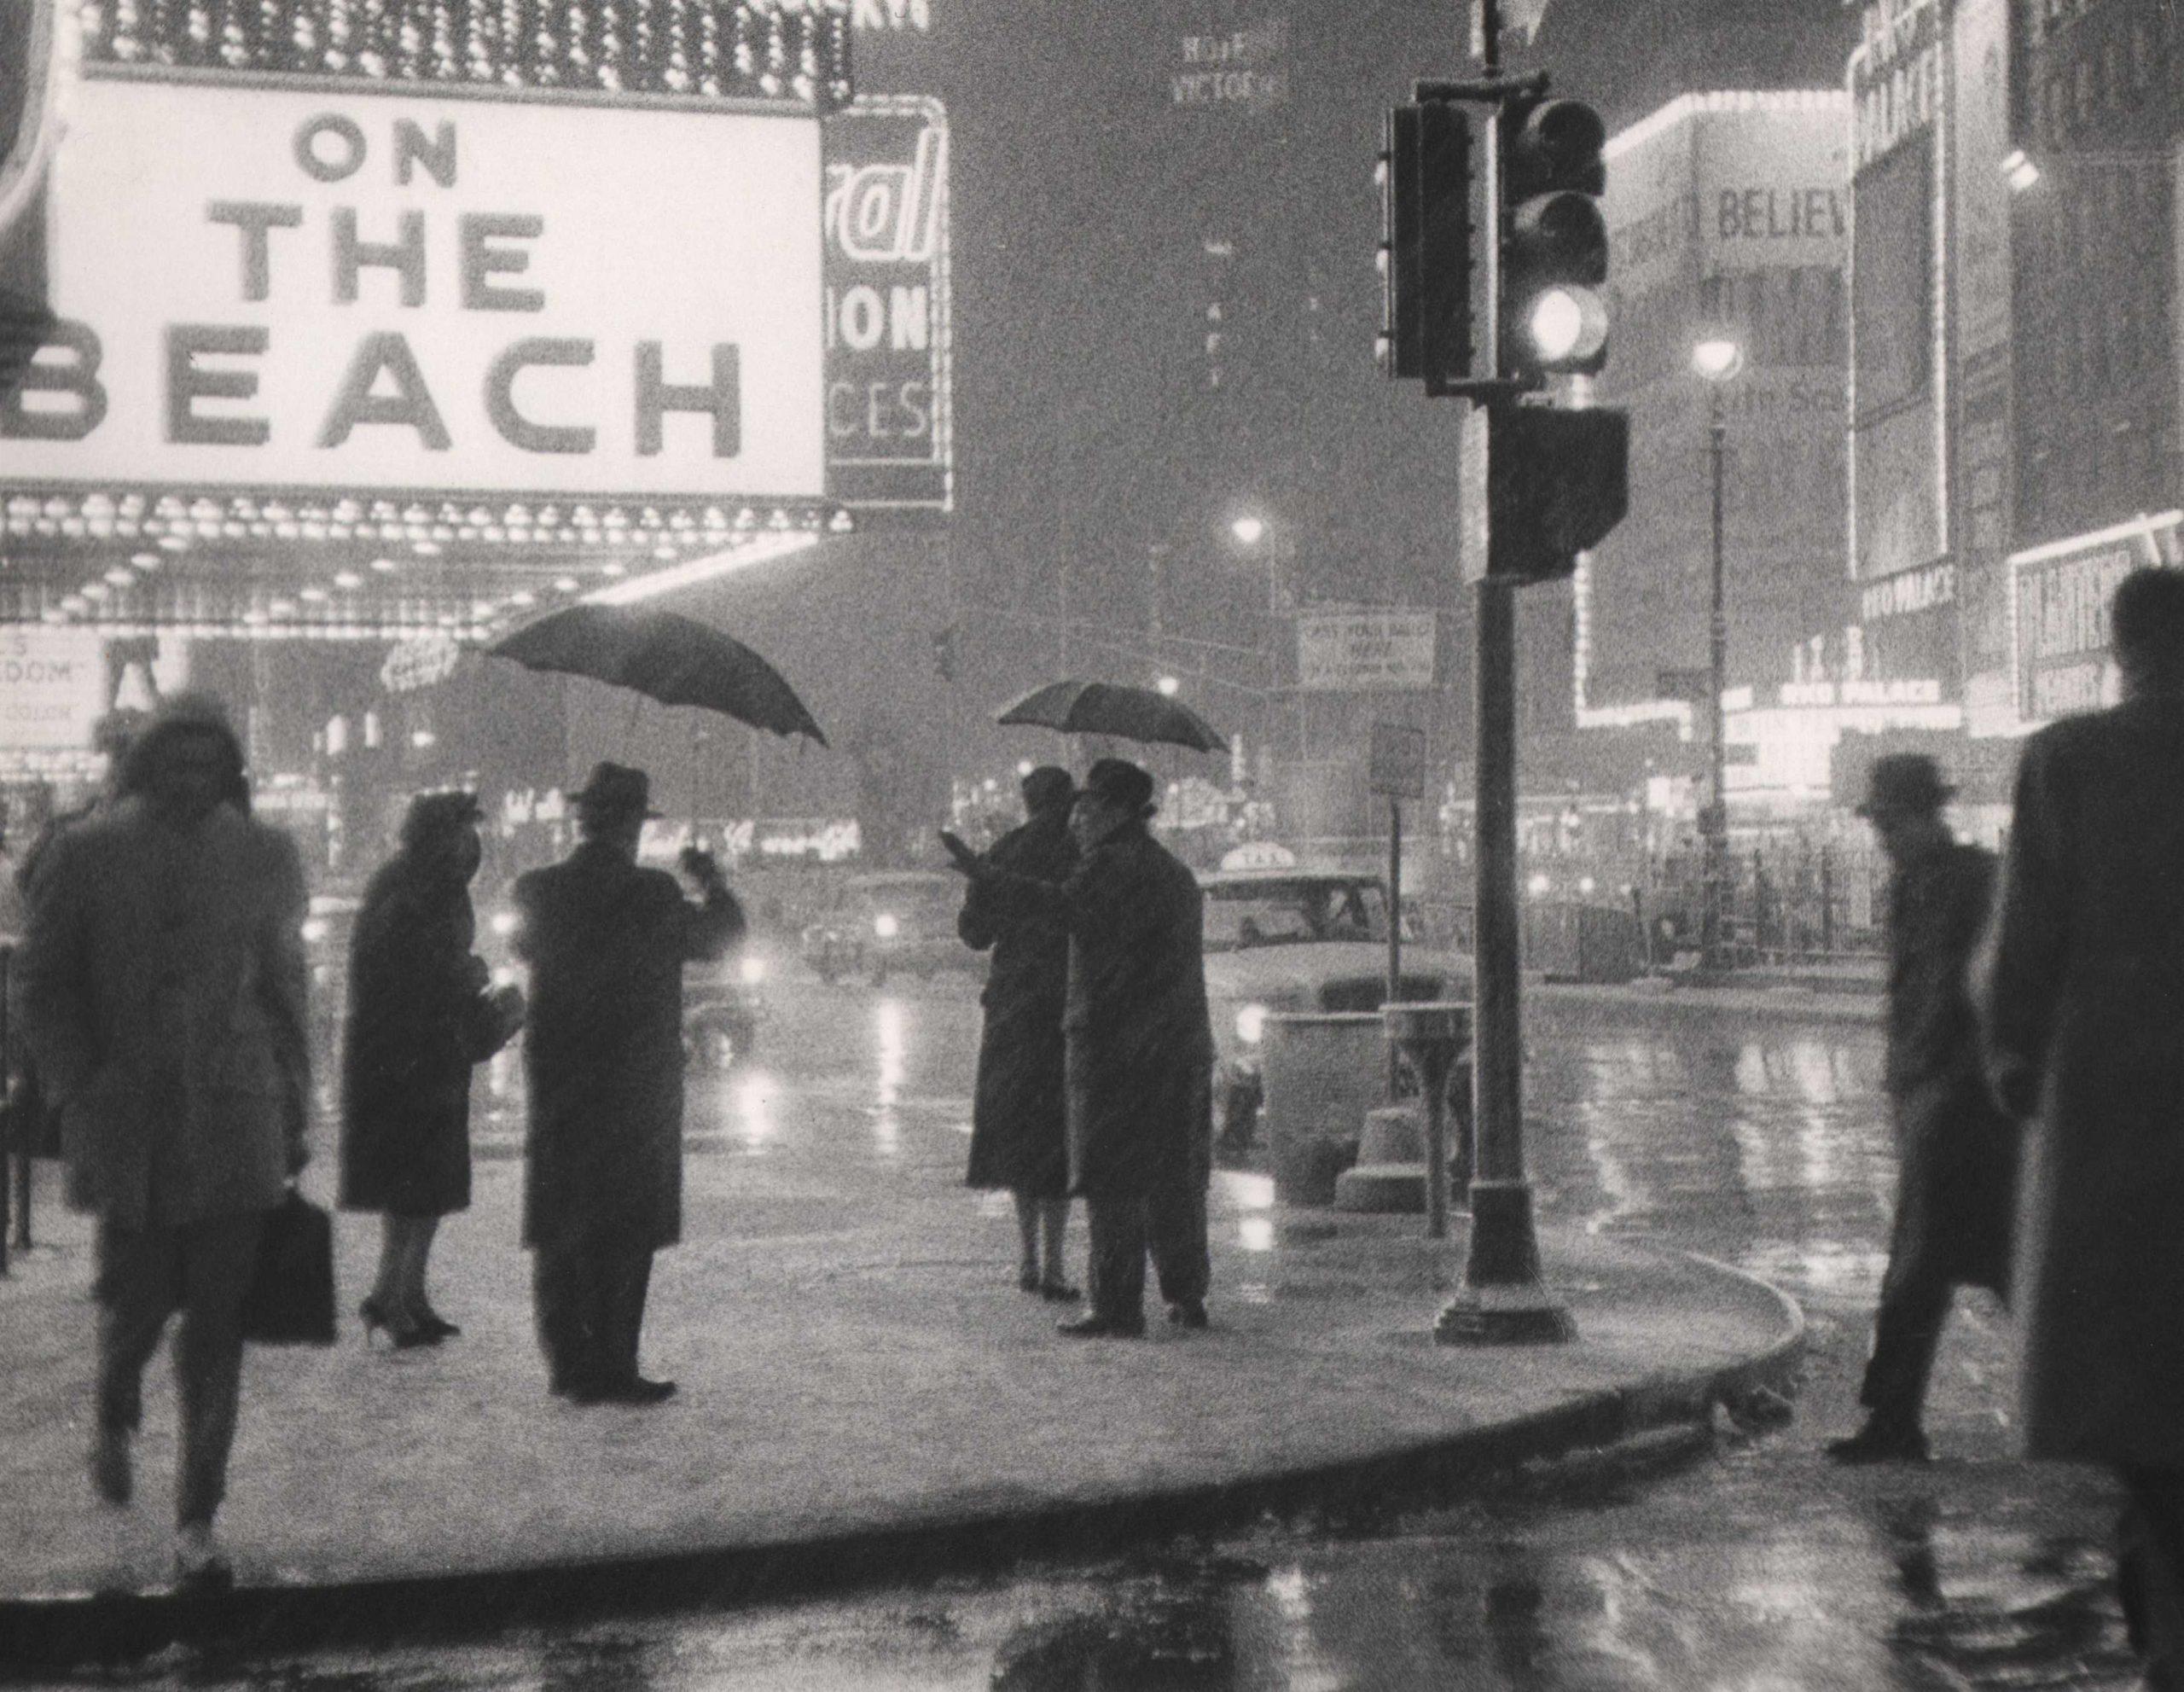 Bedrich Grunzweig, Times Square at Night, New York City, c. 1959